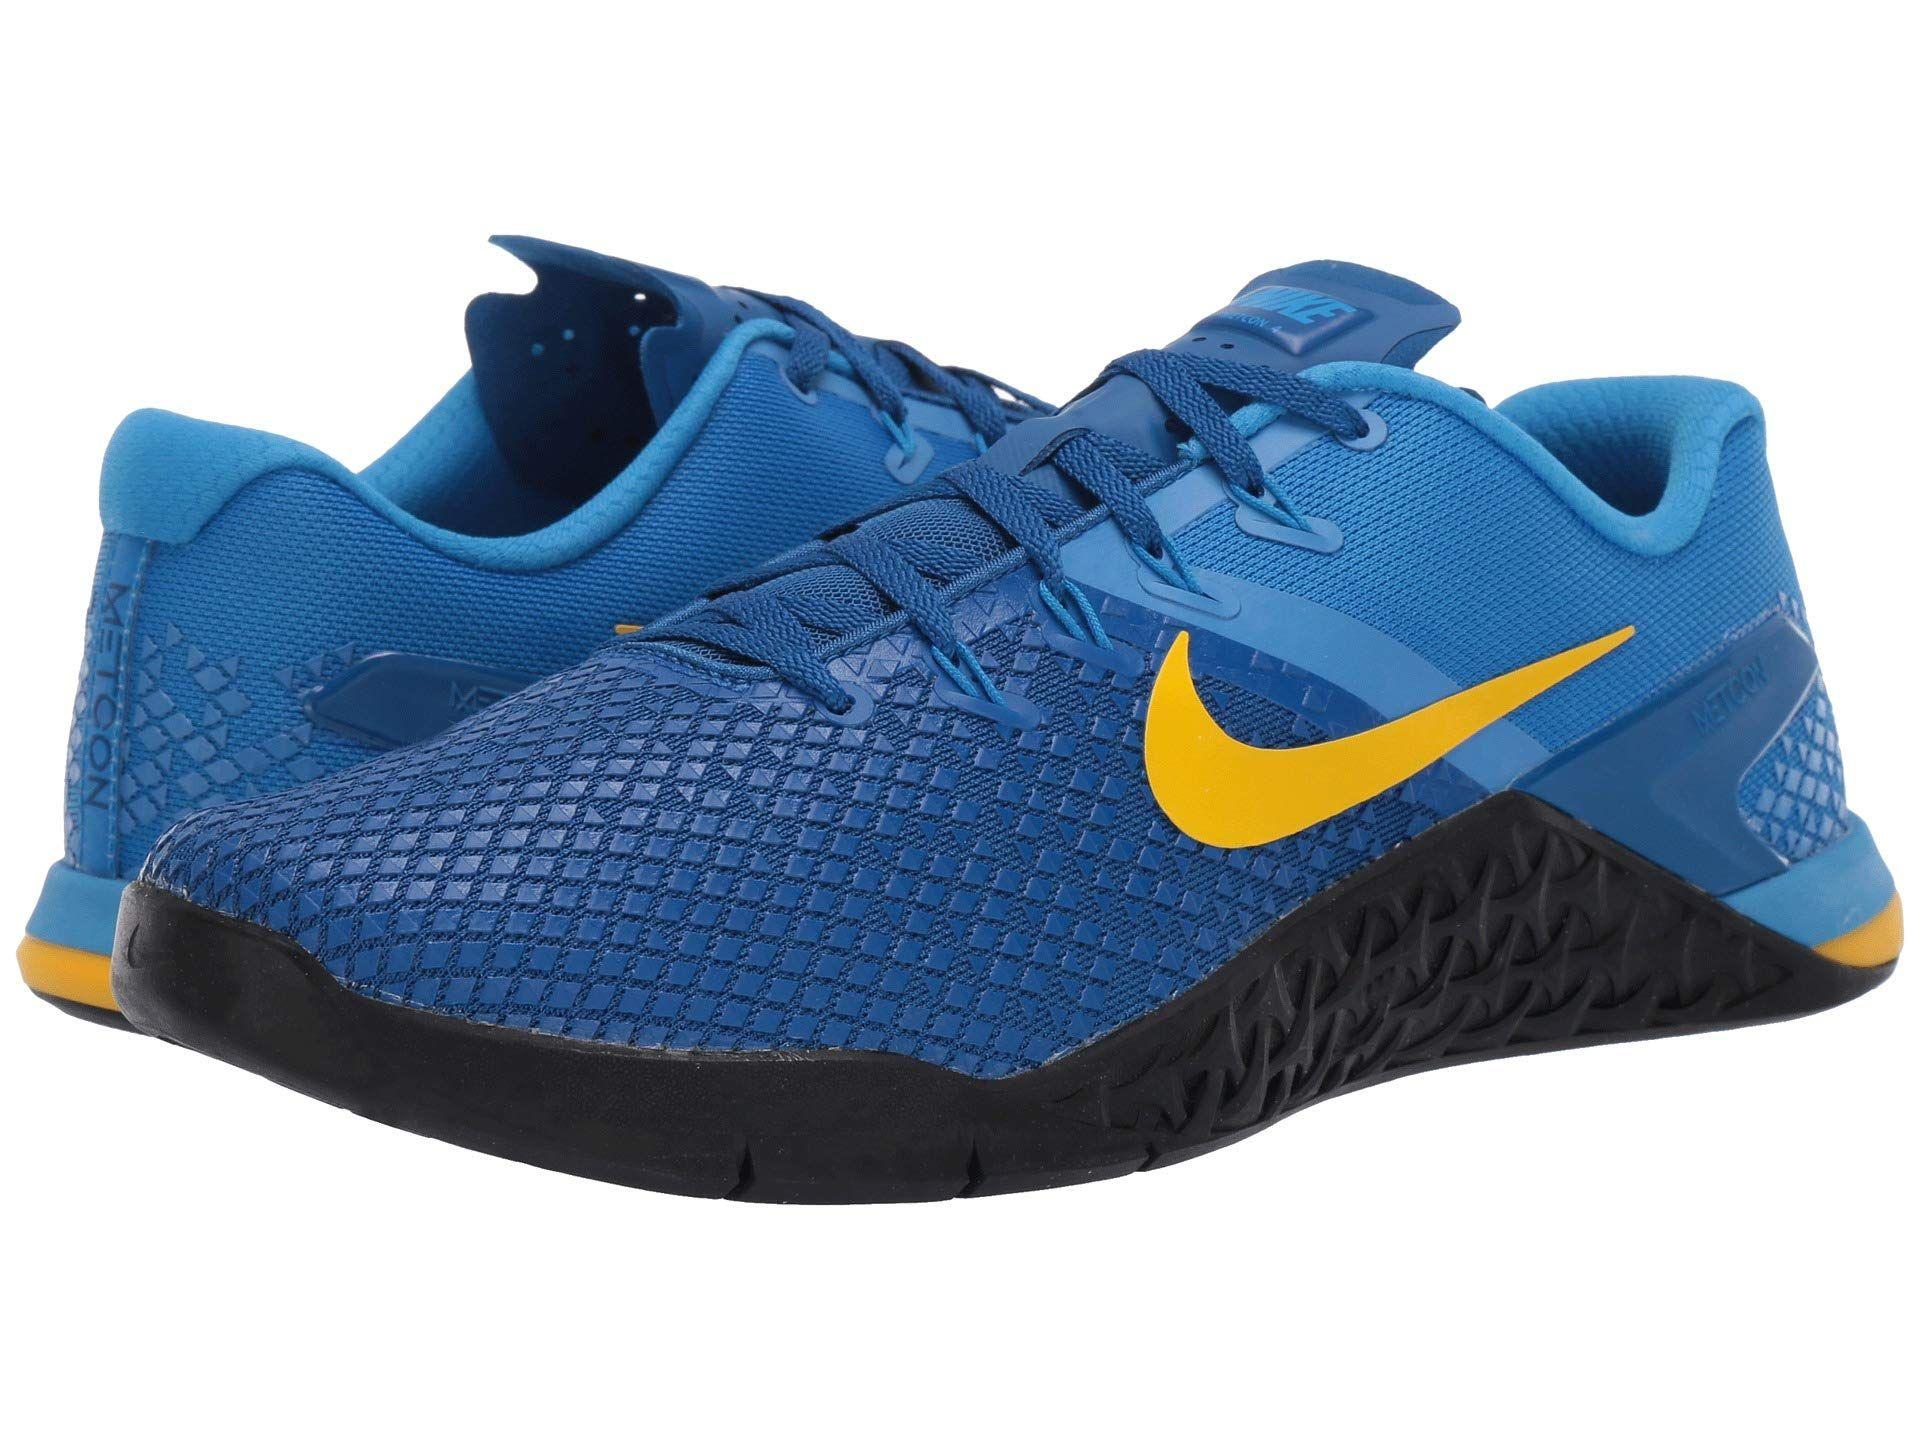 0fa1de76f3603 12 Best Shoes for CrossFit Training Workouts for Men 2019